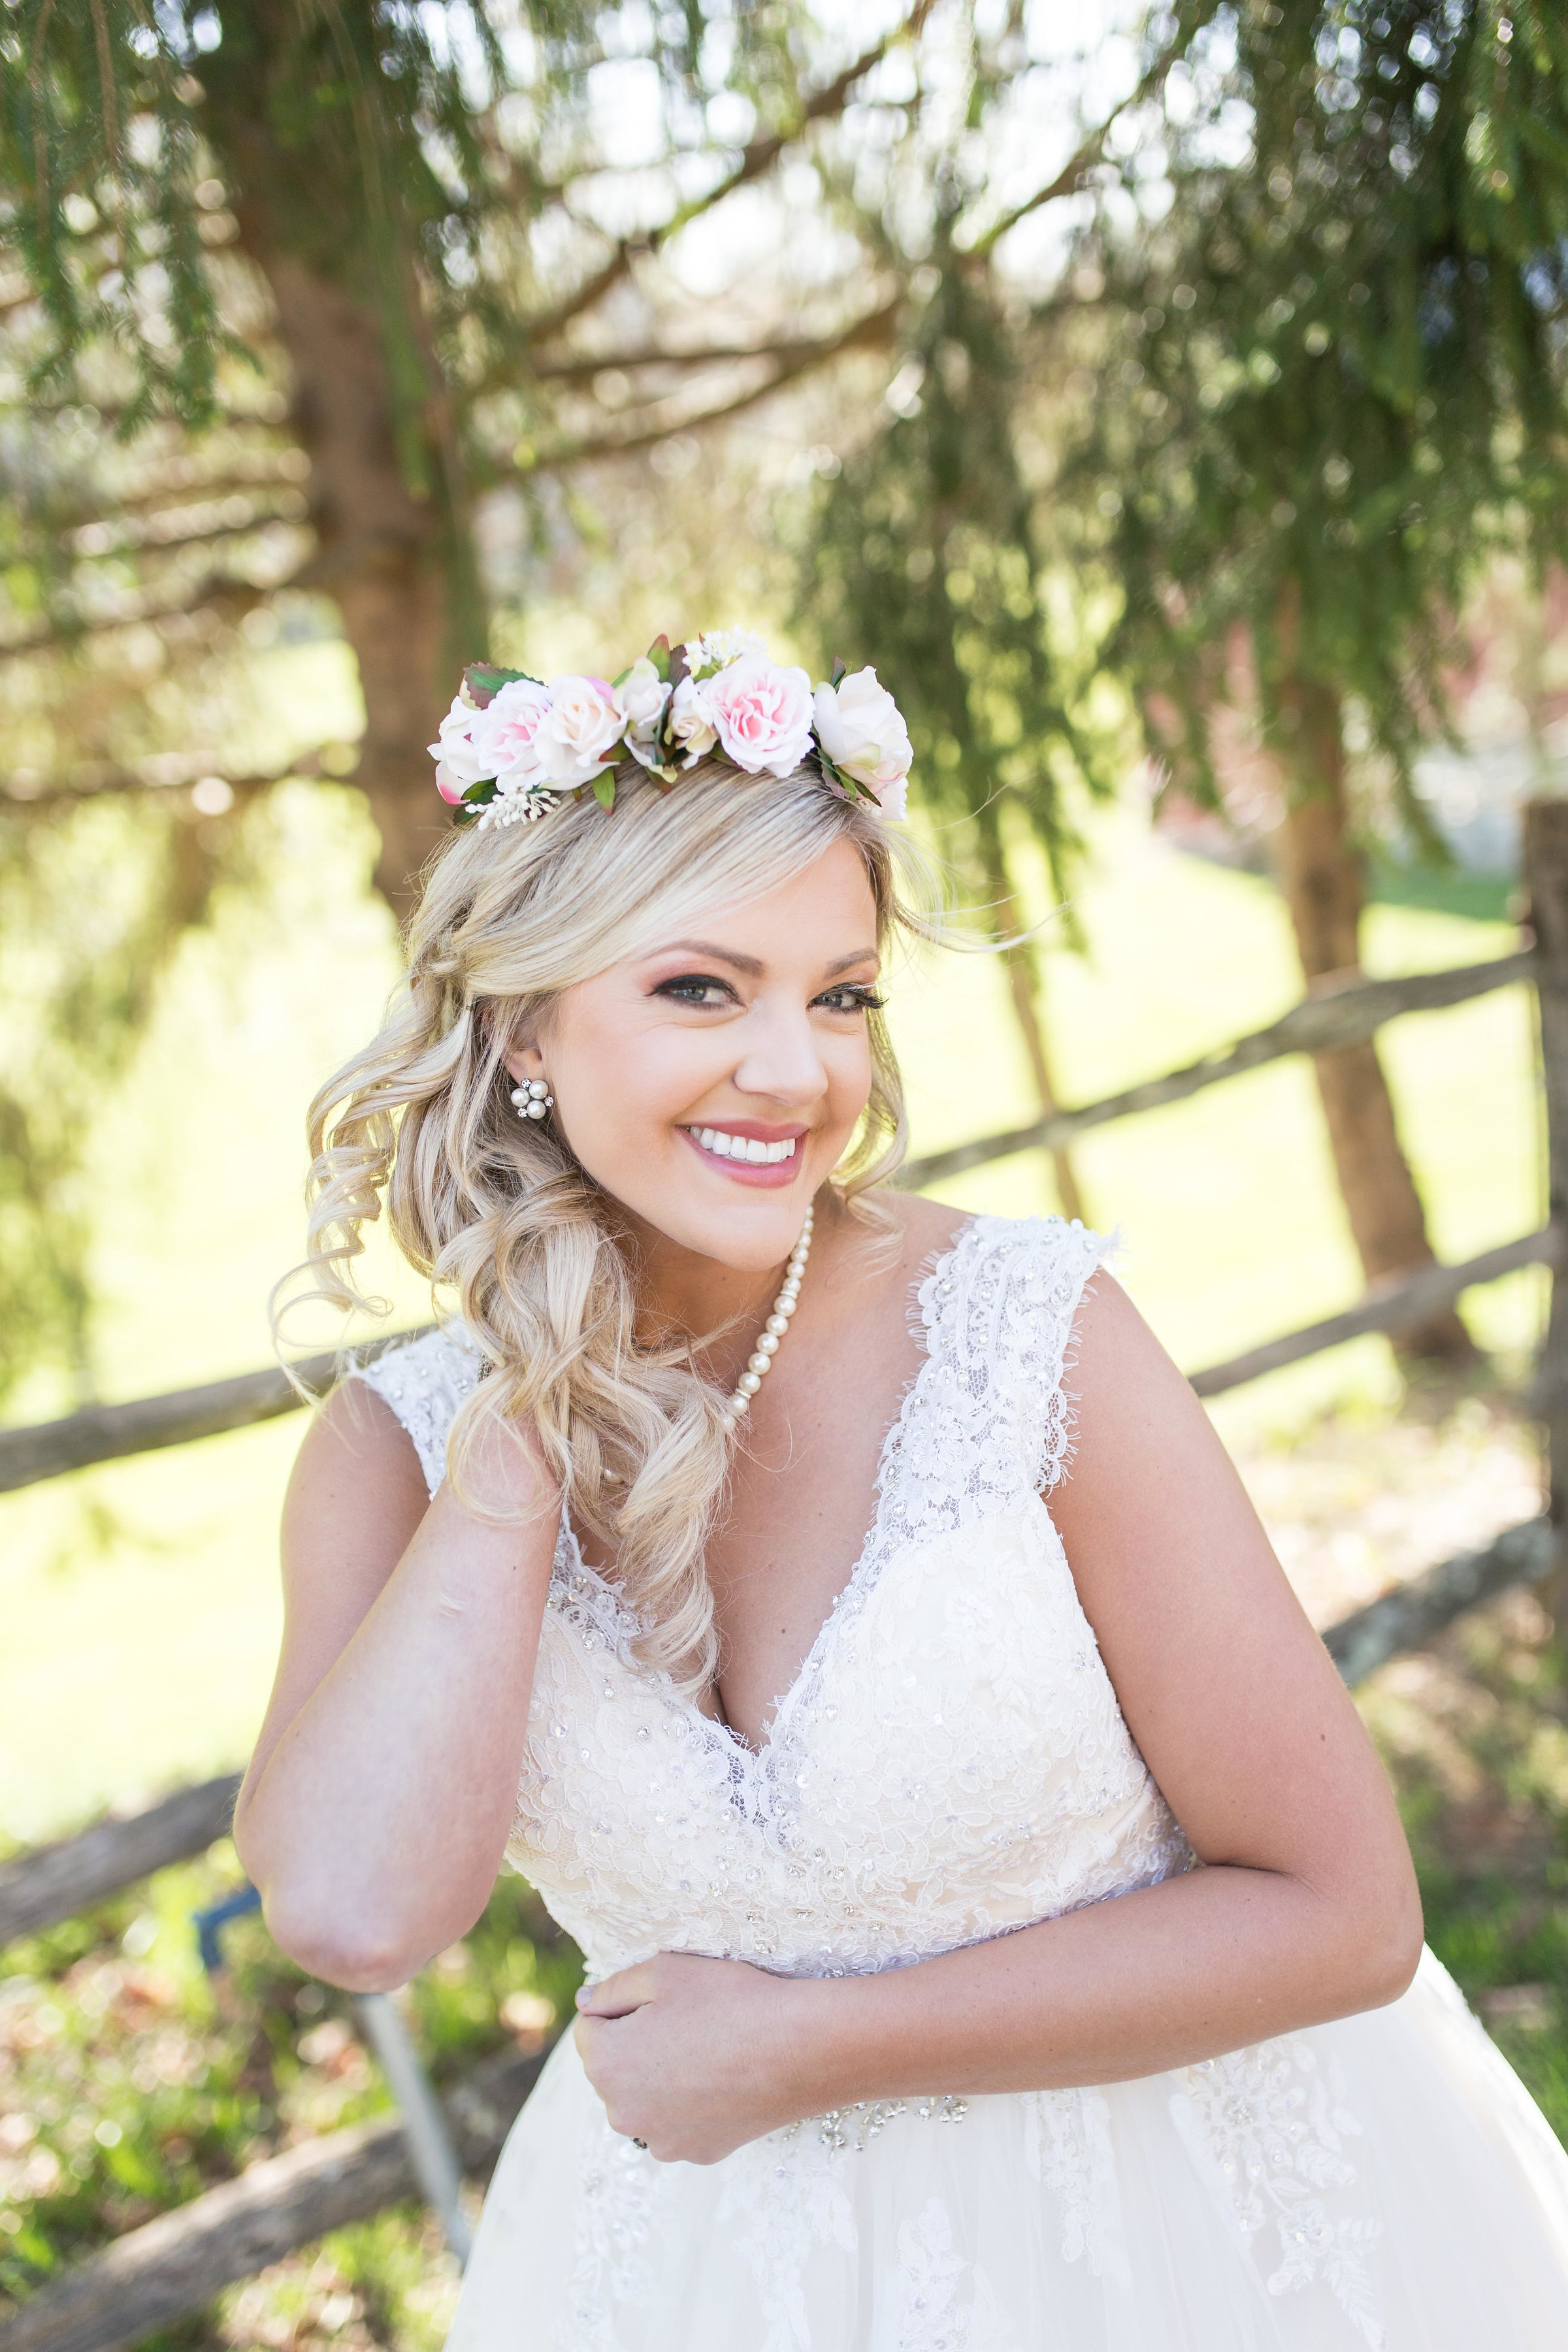 Honeysuckle-Hill-Asheville-Wedding-Venue-Ann-Cordell-Bridal-37.JPG